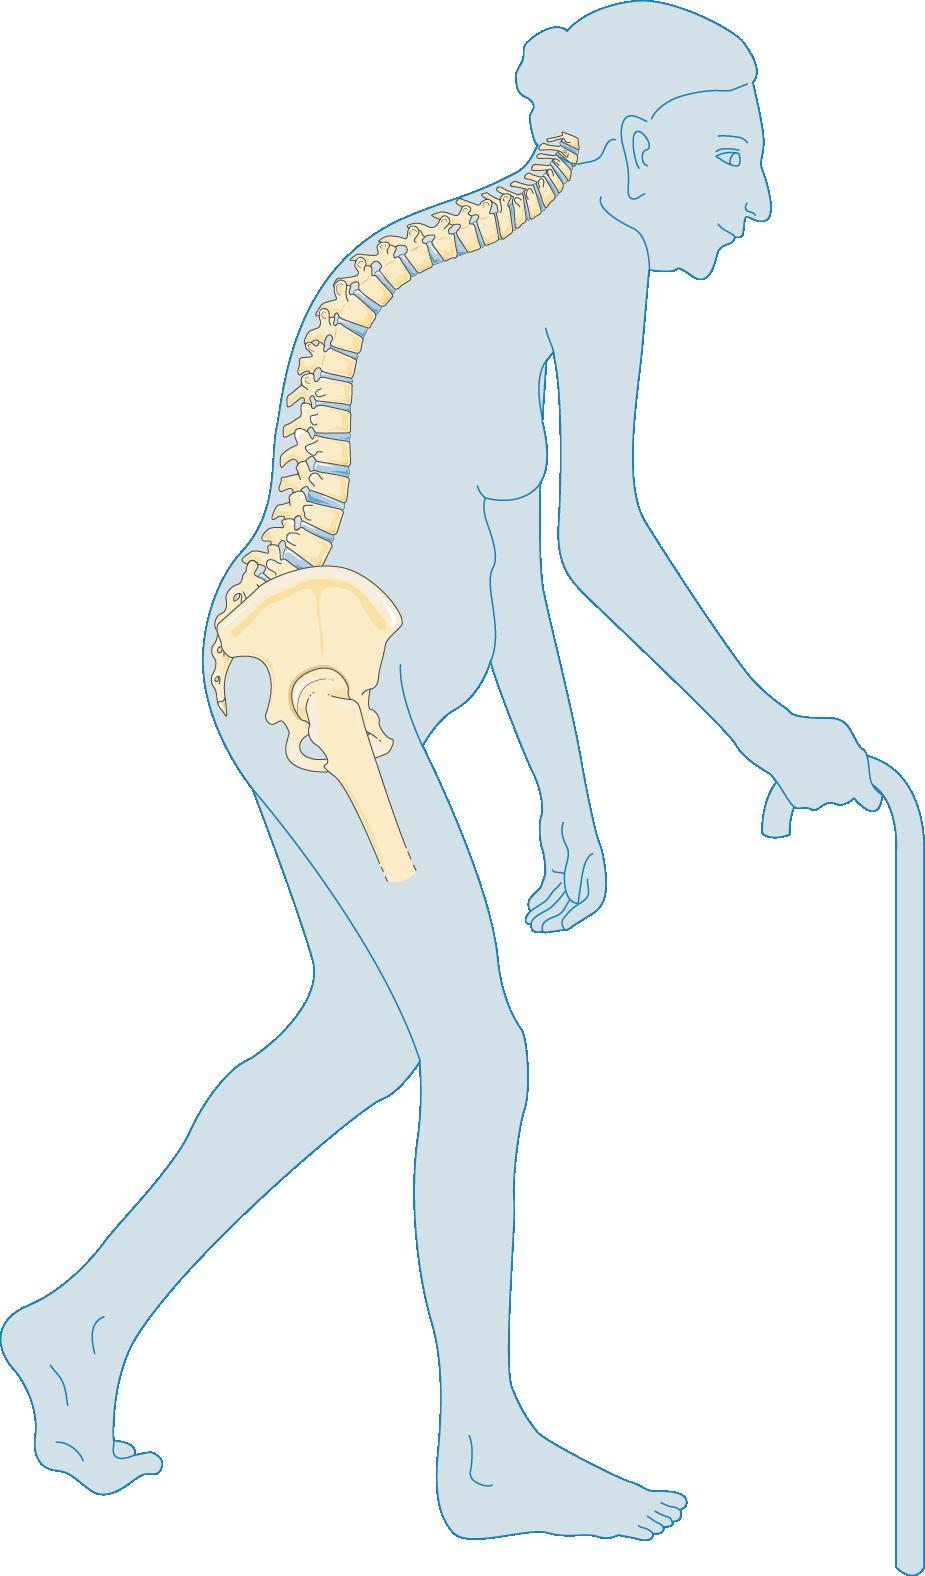 Leg clipart leg fracture, Leg leg fracture Transparent FREE